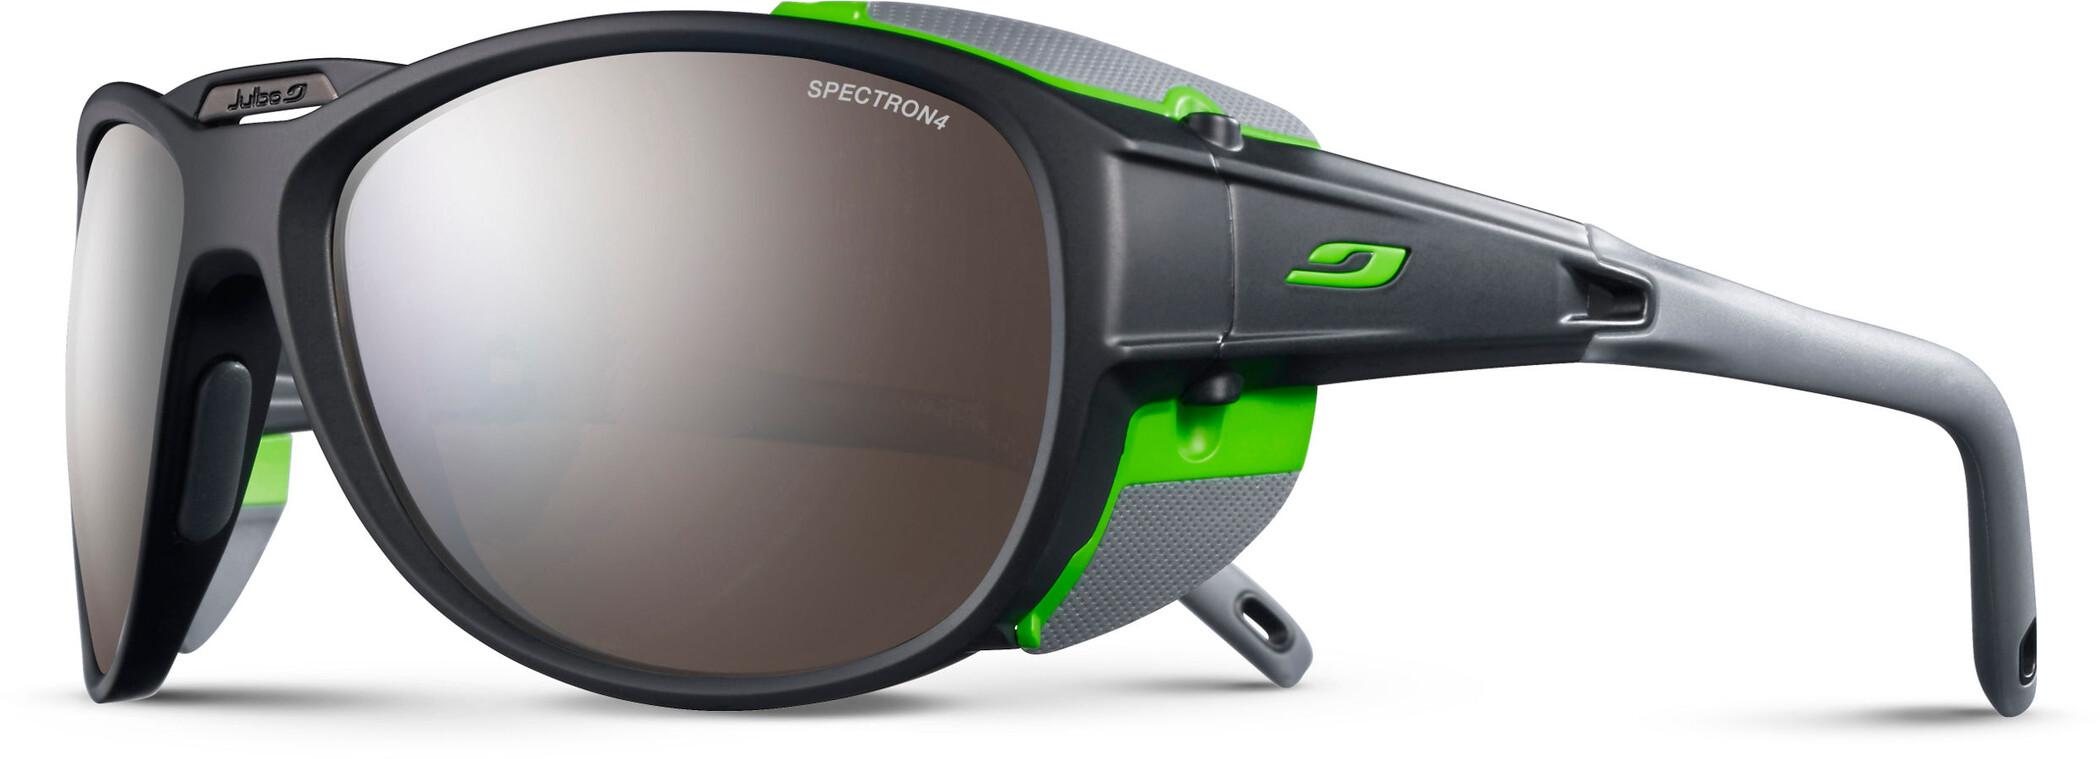 Julbo Exp*** 2.0 Spectron 4 Solbriller, matt gray/green-brown flash silver (2020) | Glasses